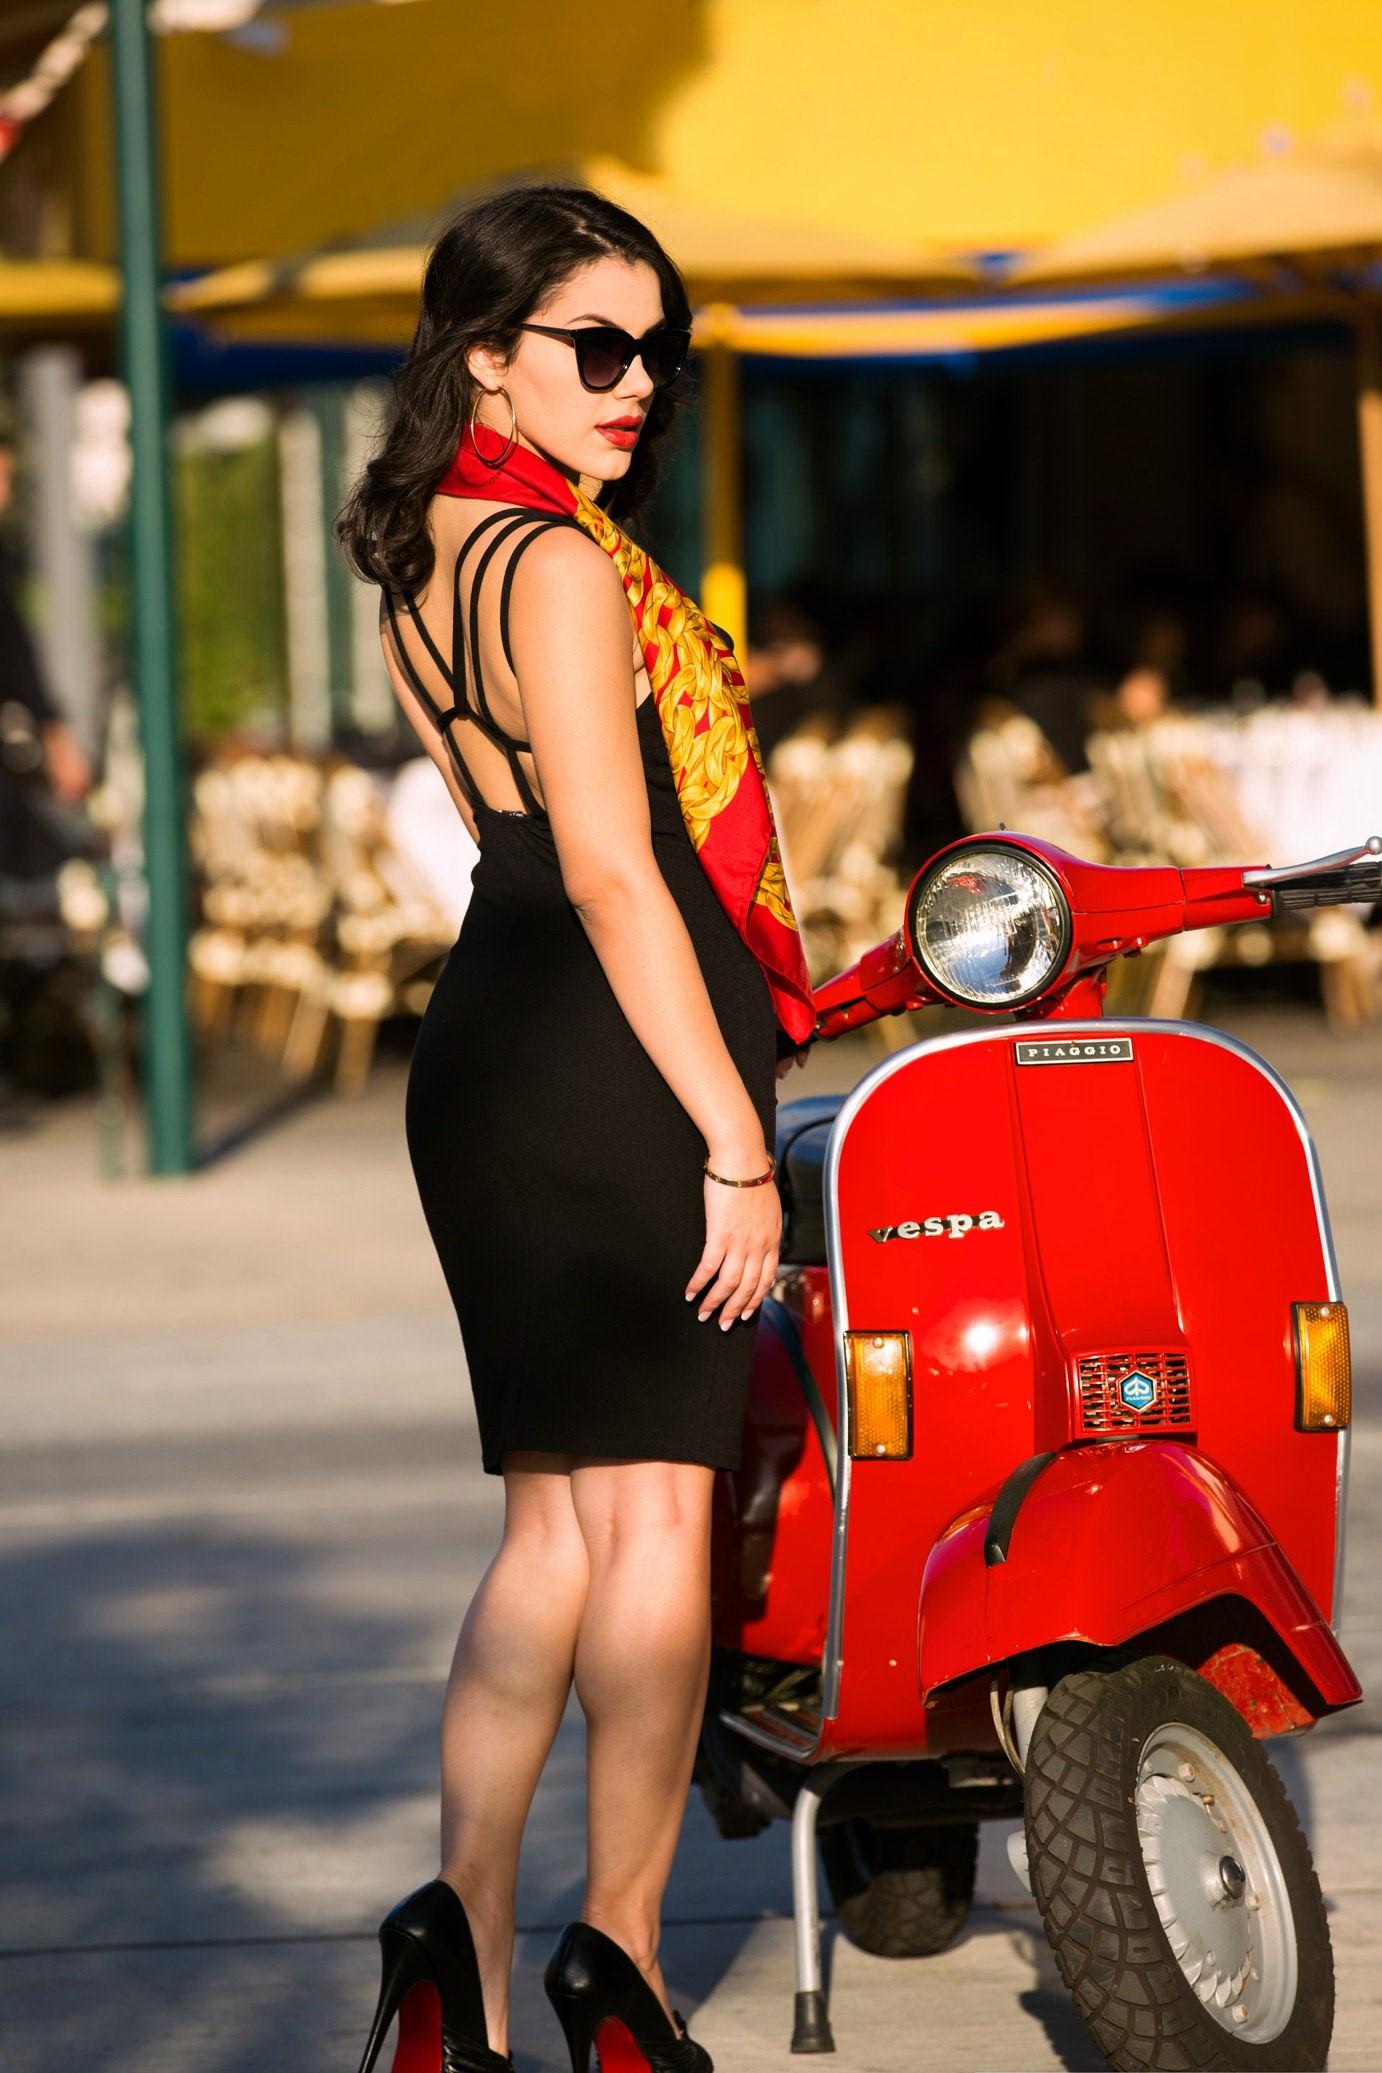 wallpaper : valentina napi, vespa, scooty, model, black dress, black